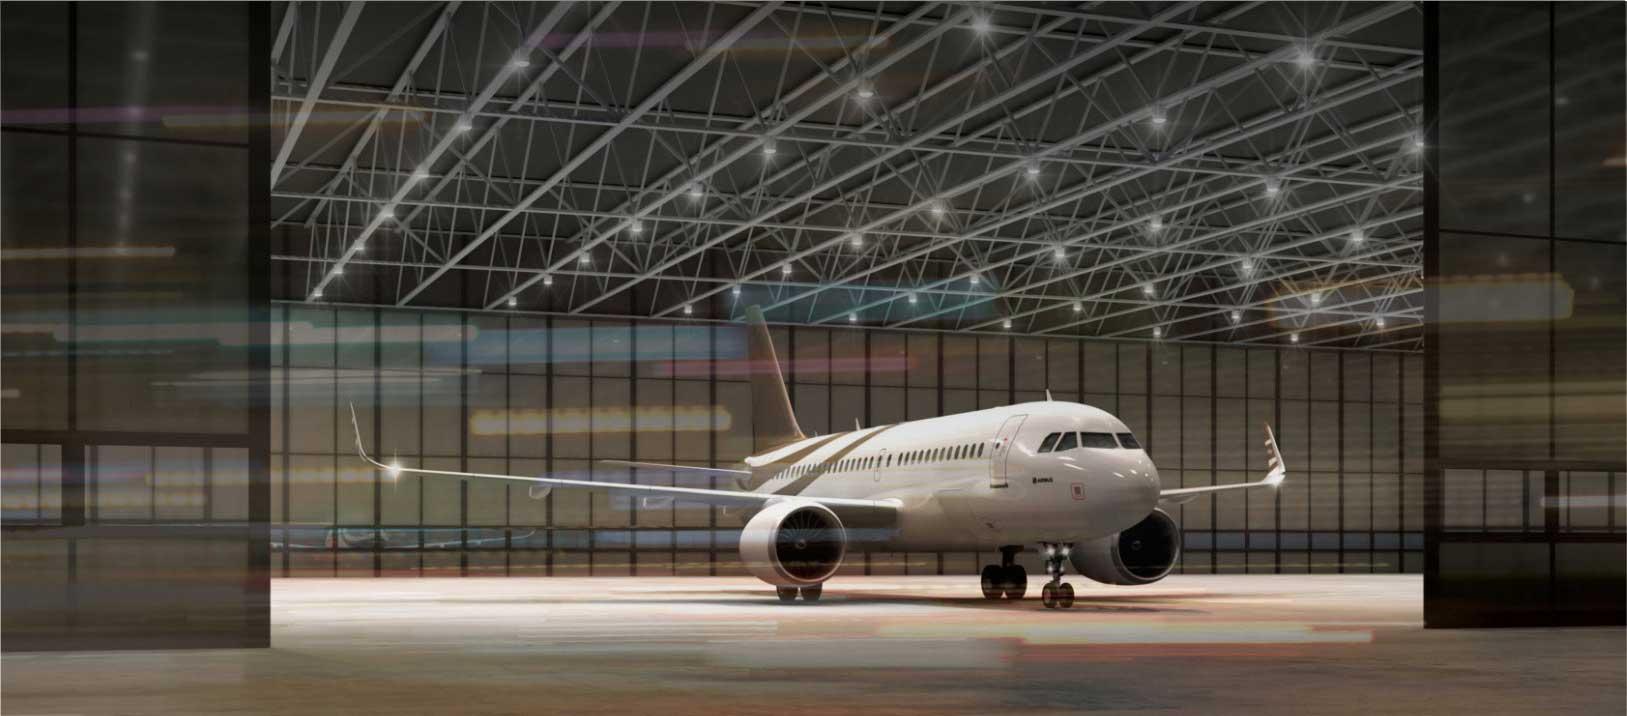 Inventory Aircraft Sales